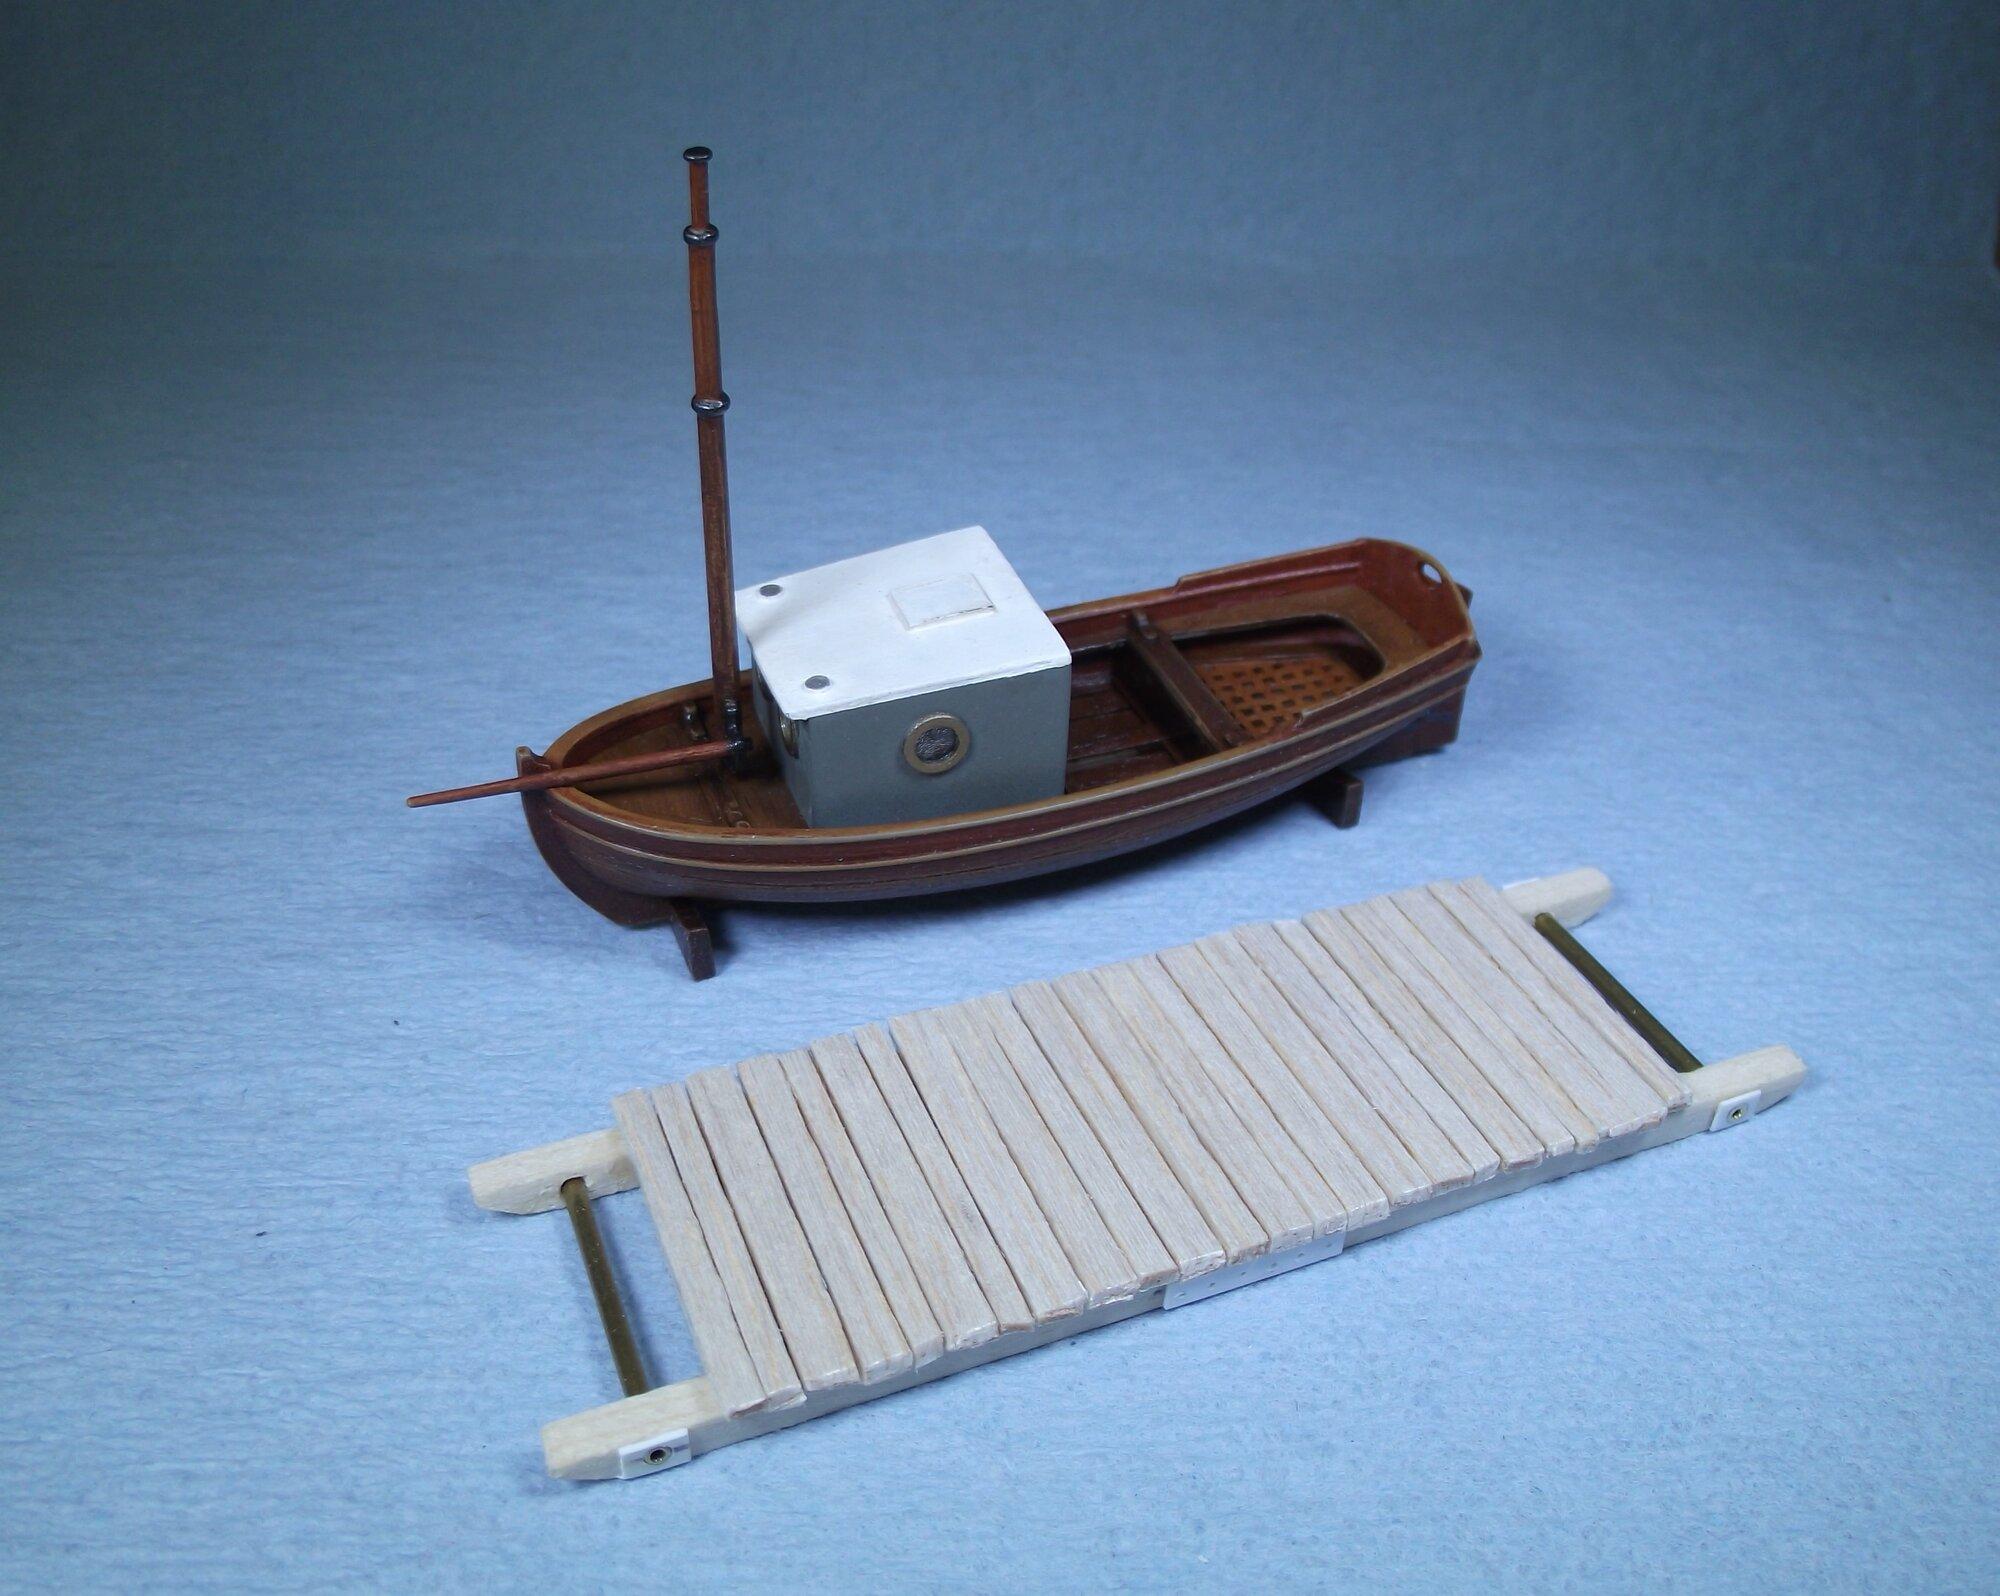 Boat_05-09-2021 (4).jpg